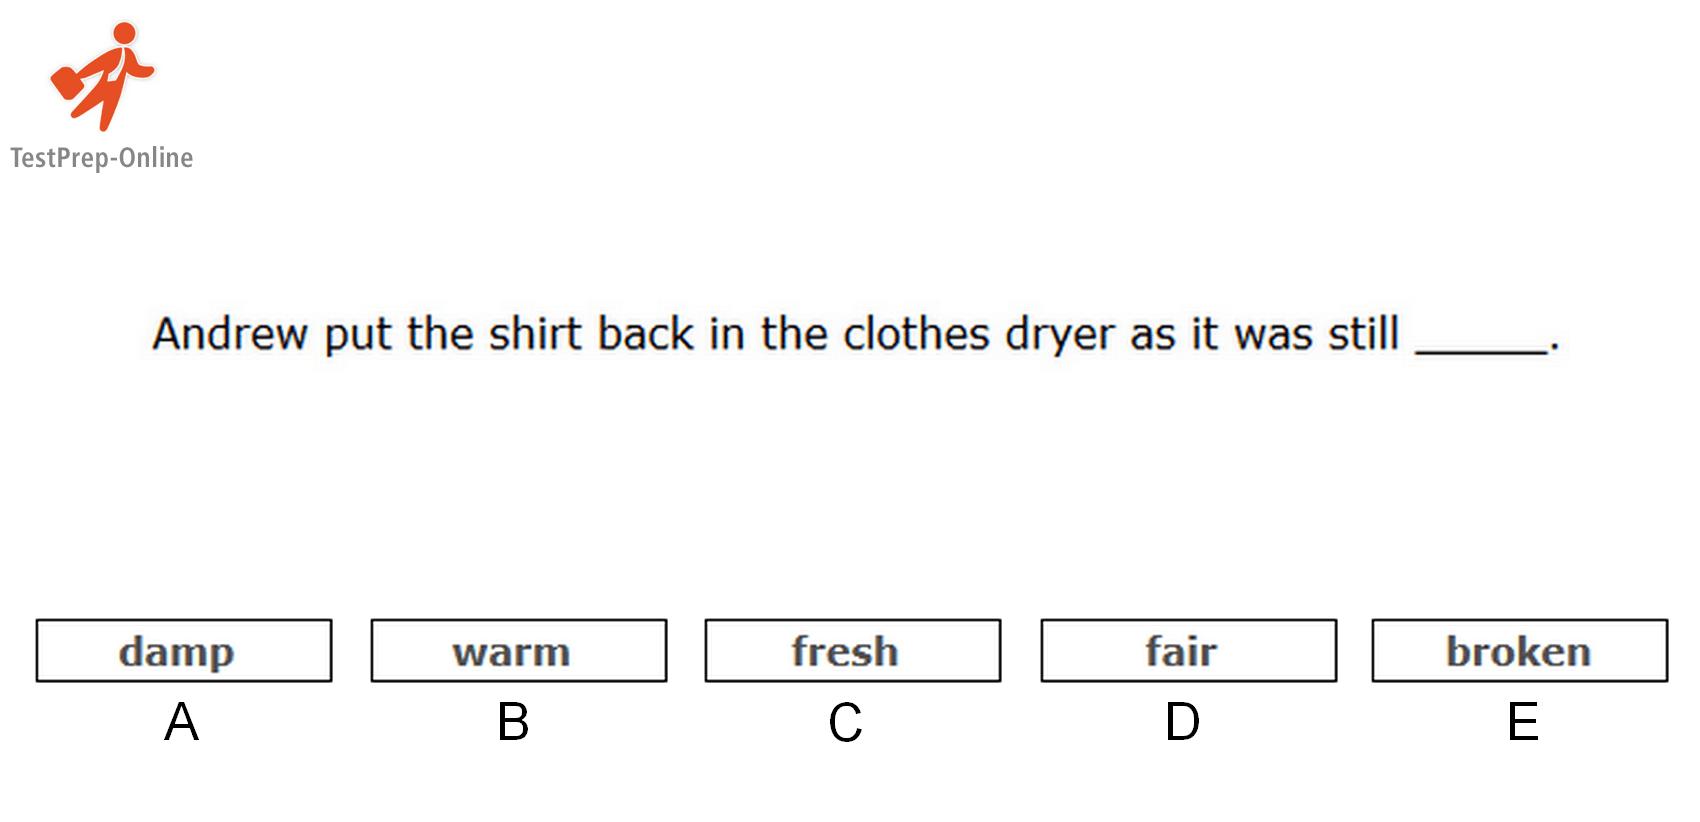 hight resolution of CogAT Verbal Sample Questions \u0026 Explanations - TestPrep-Online